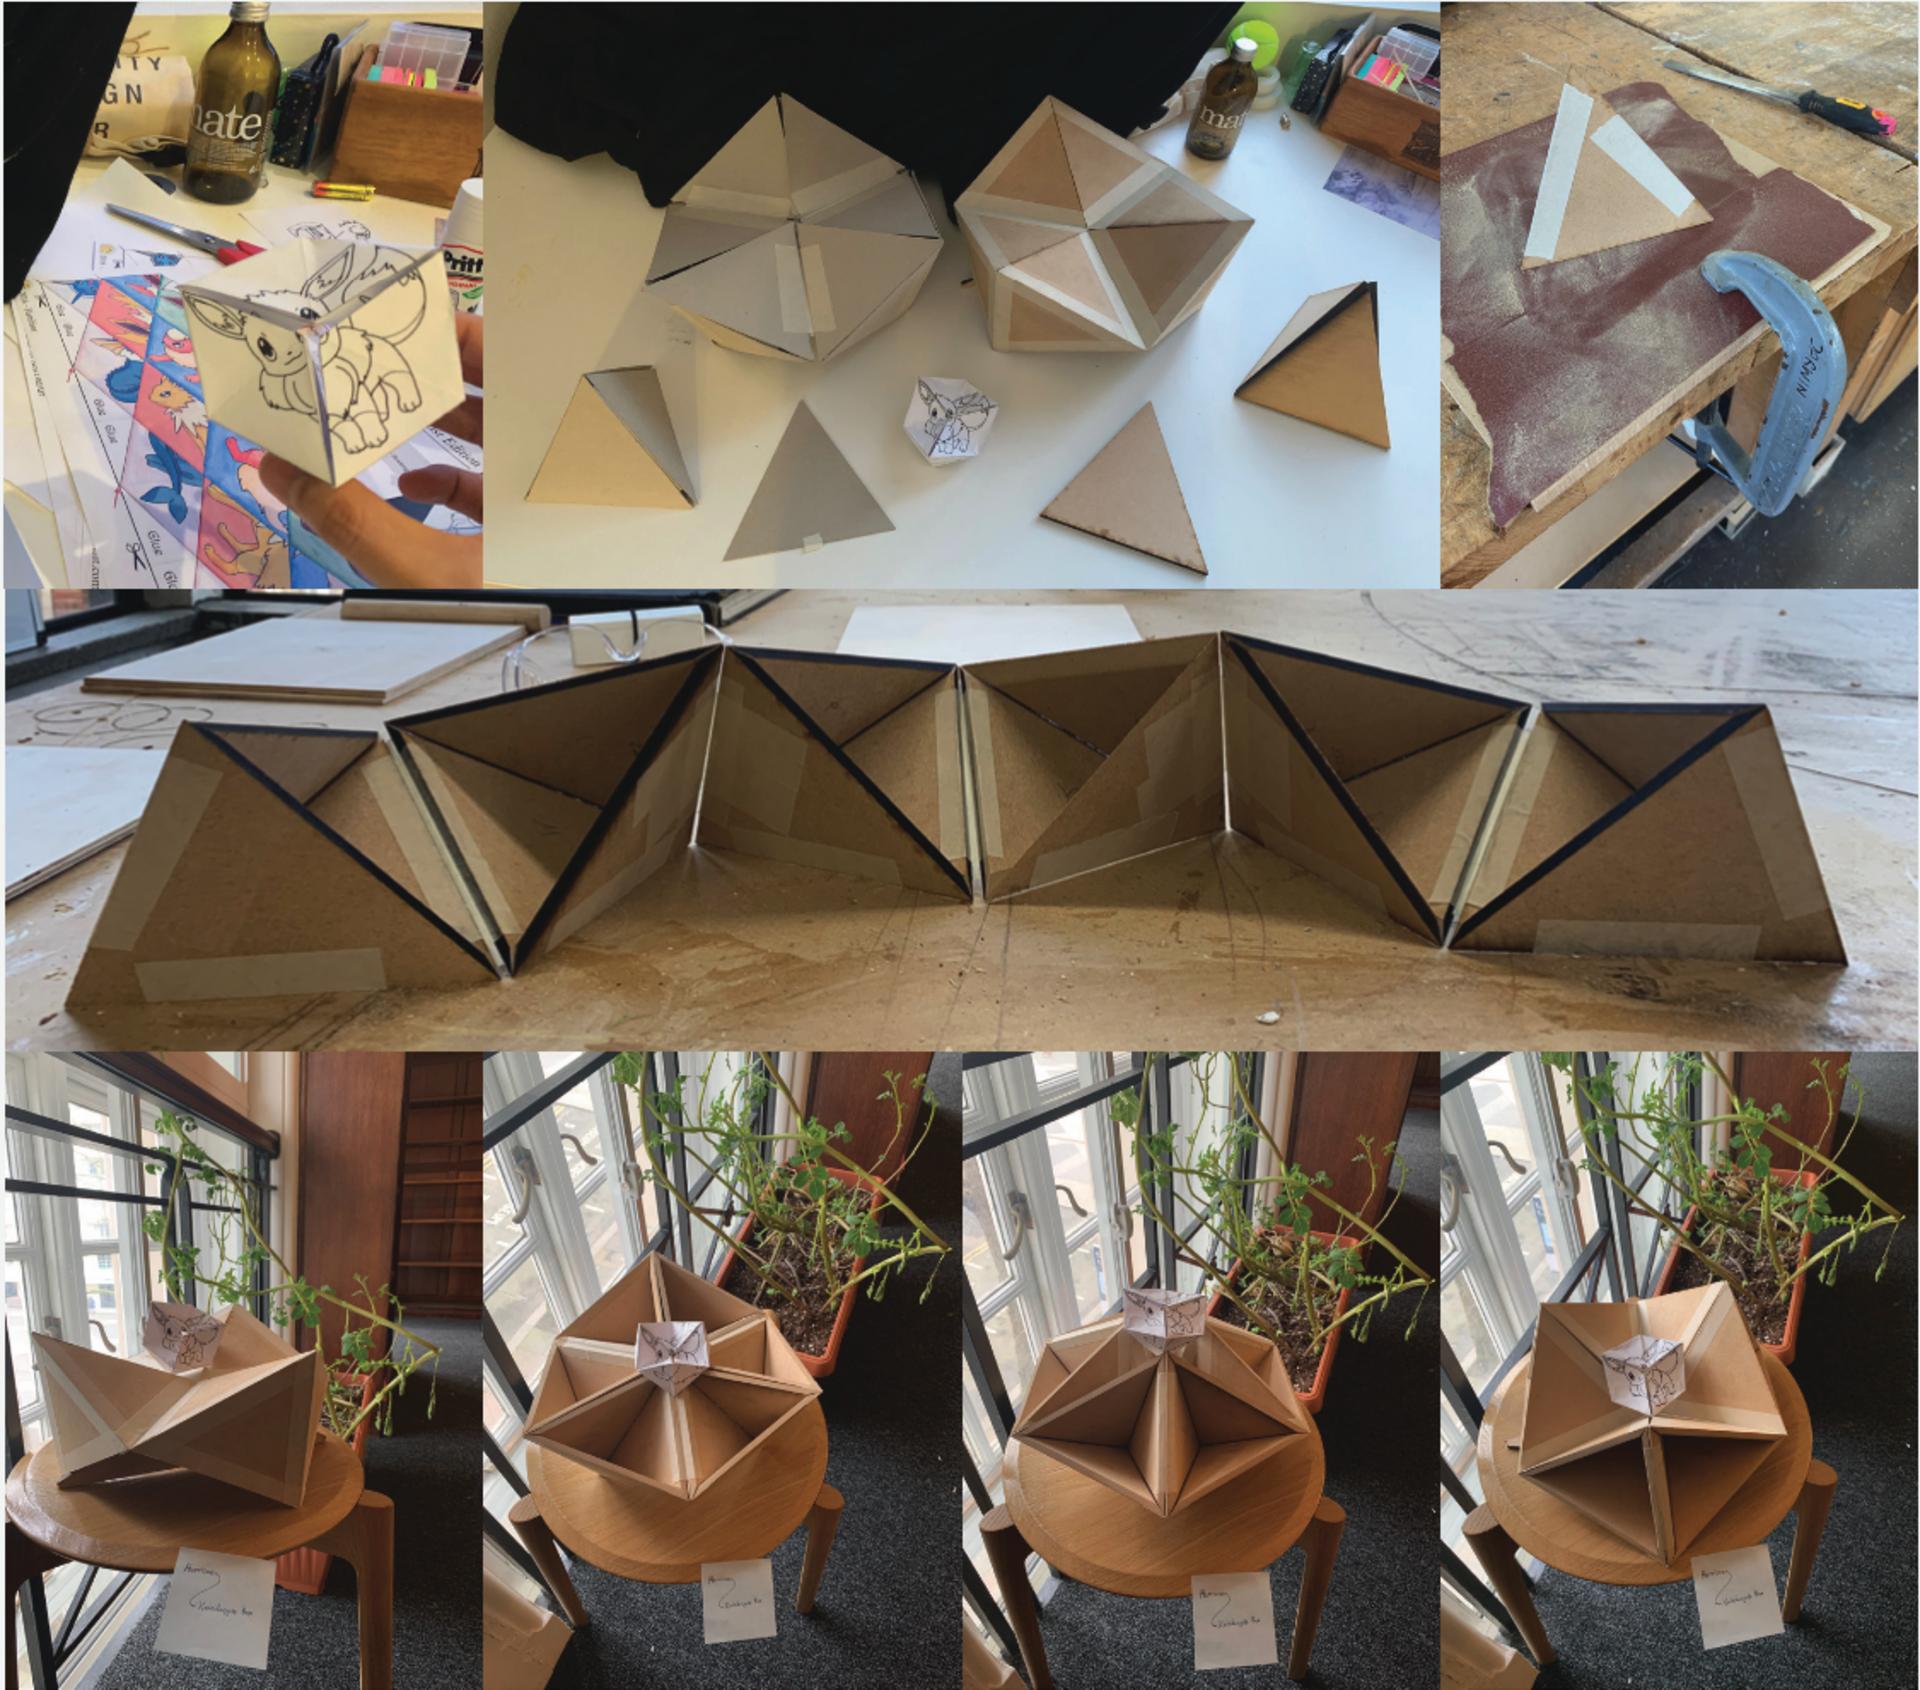 Kaleidocycle Box: Process